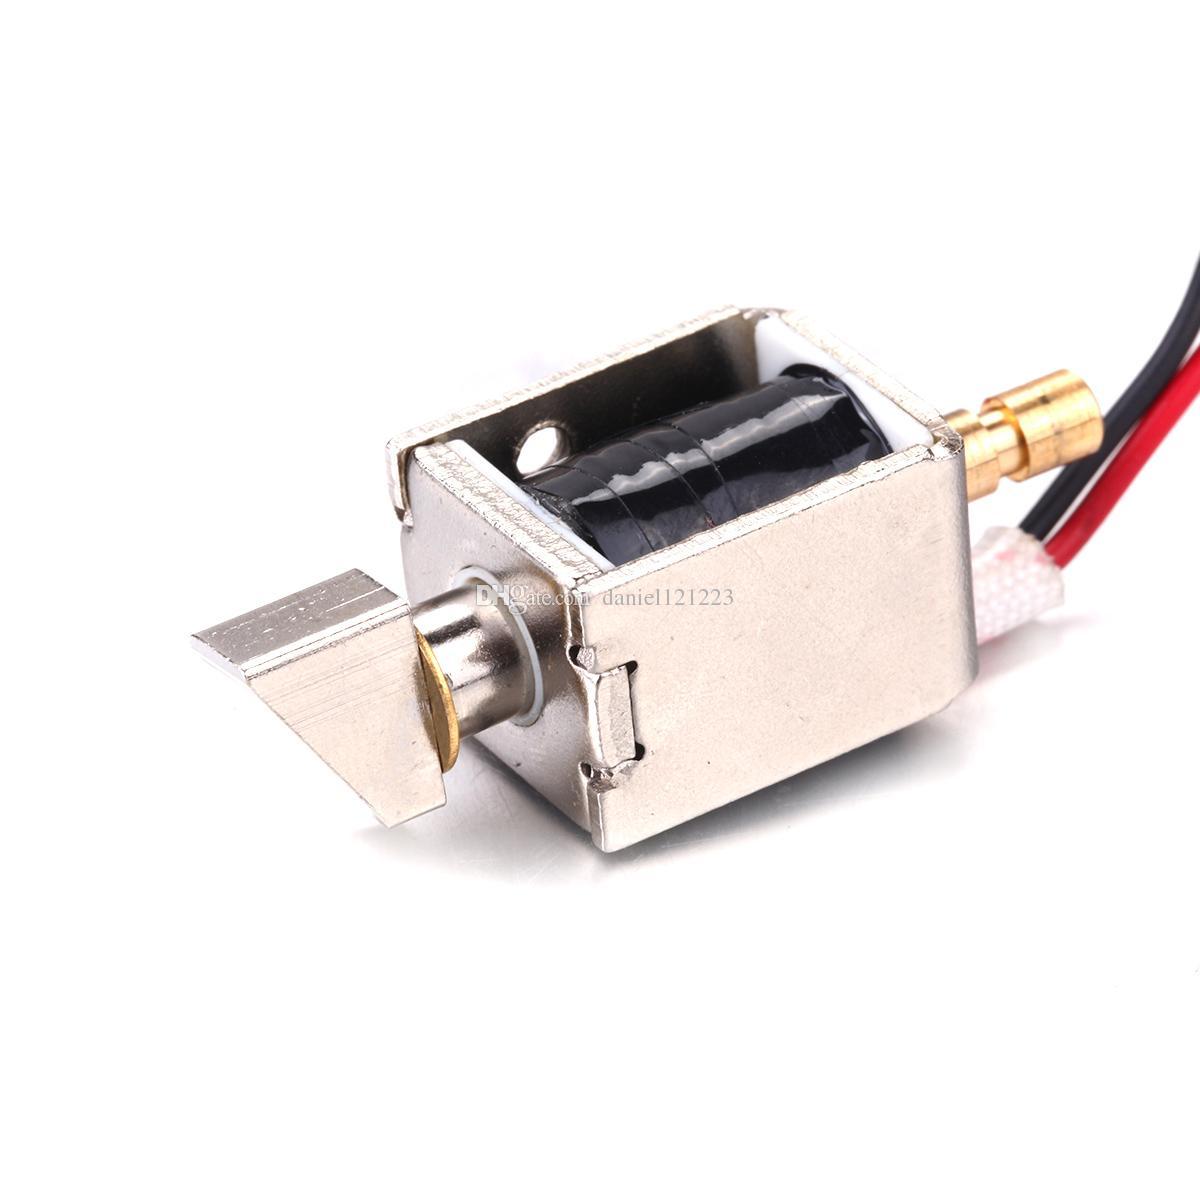 DC 12V 0.43A / 2A Mini Electric Bolt Lock Cabinet Small Cabinet Lock / Solenoide Door Lock, DC 12V, 0.43A